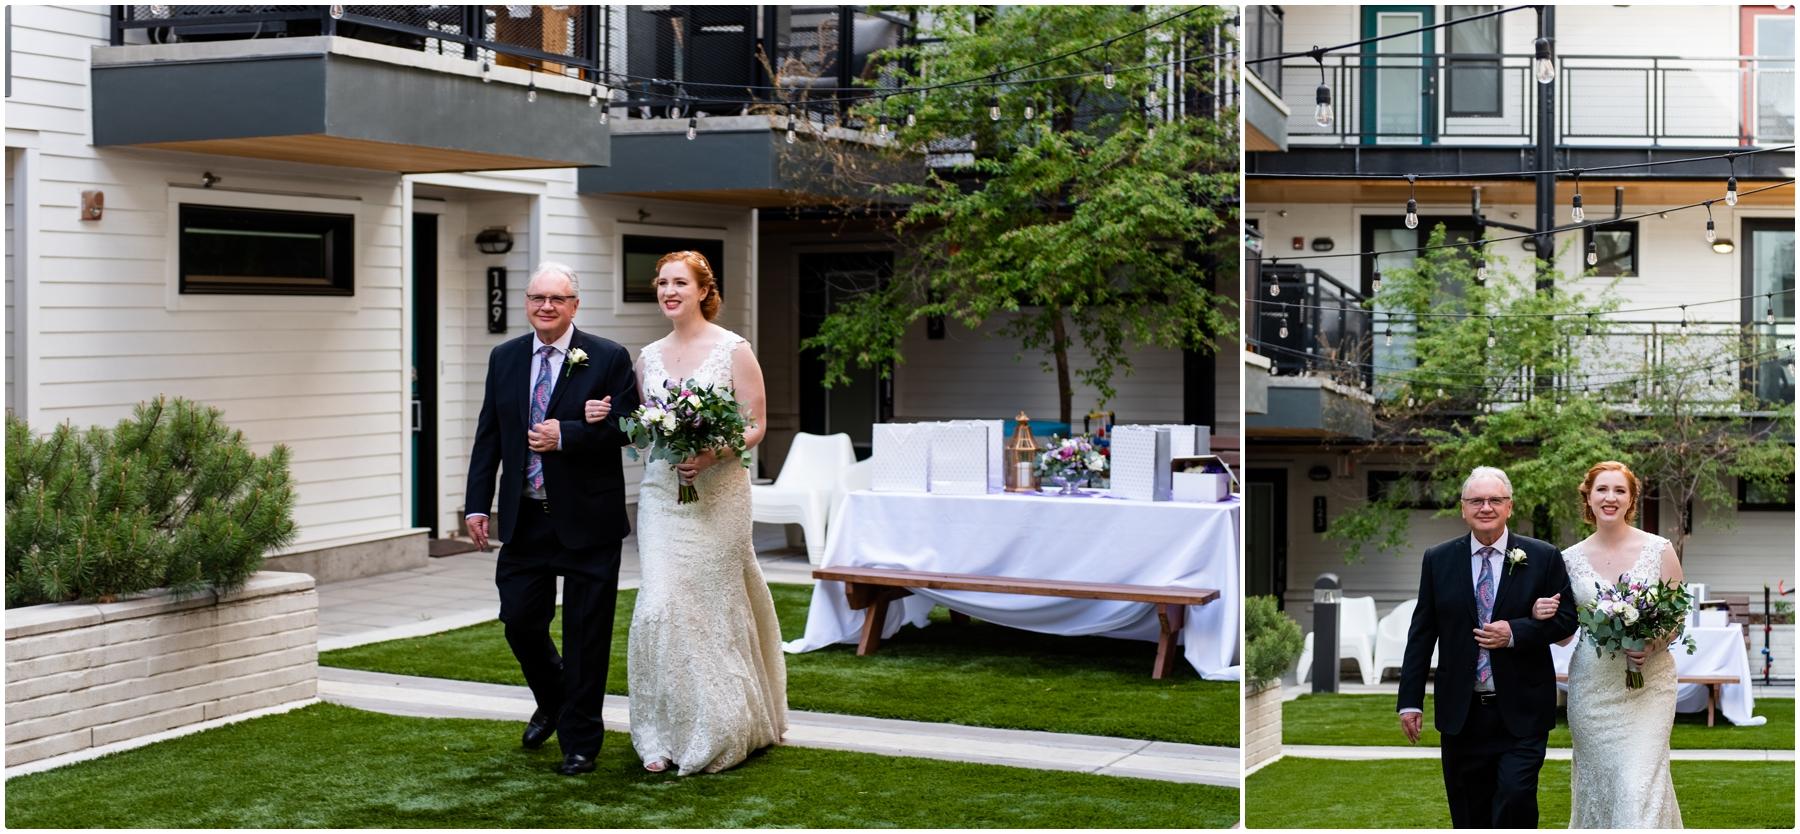 Urban Intimate Wedding Ceremony Photographer Calgary